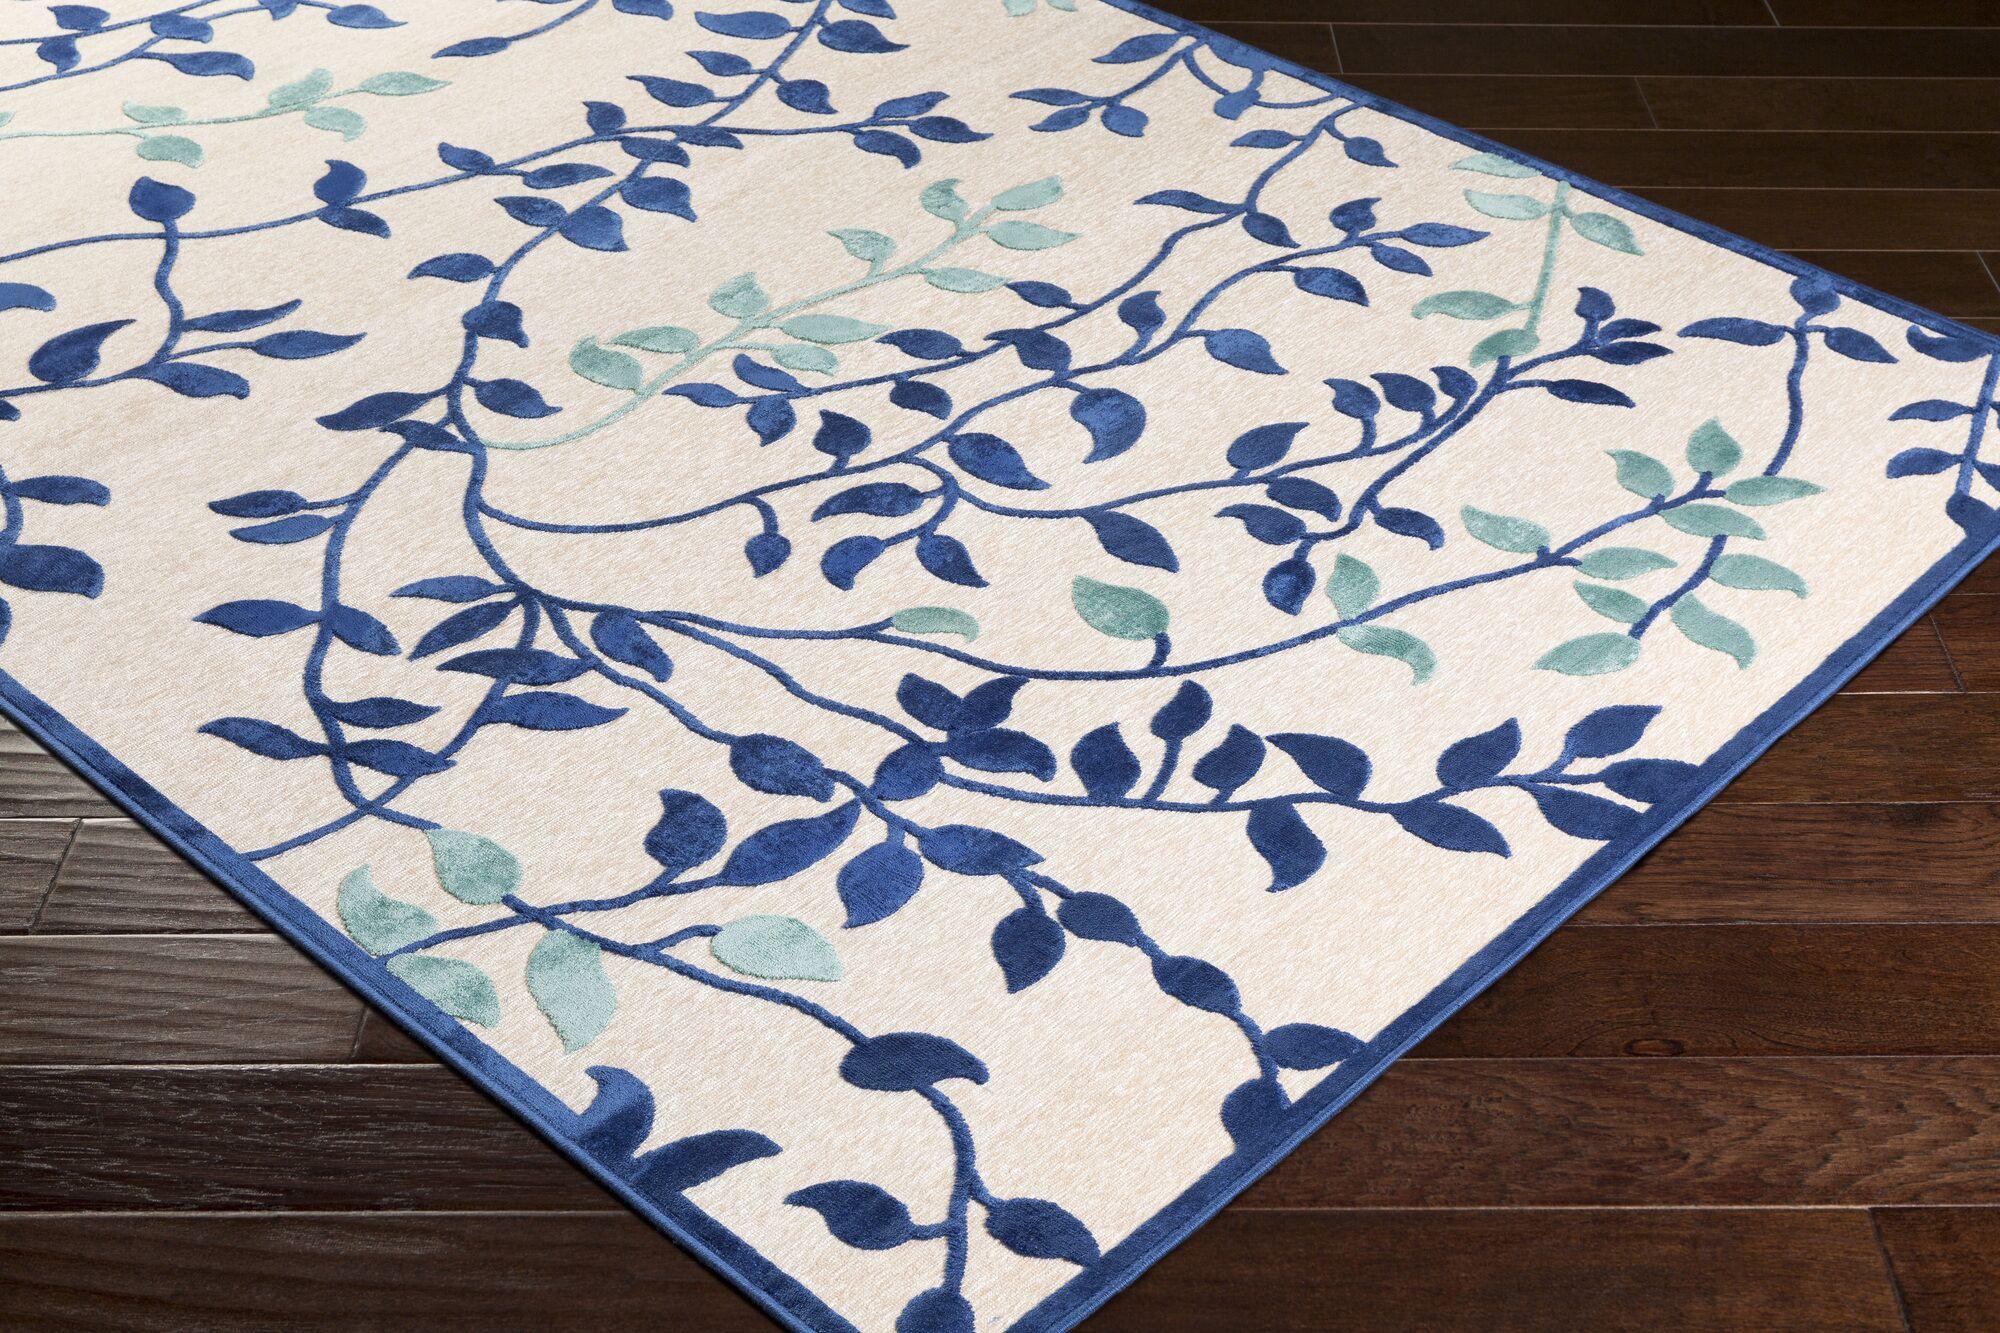 Holoman Transitional Floral Bright Blue/Teal Area Rug Rug Size: Rectangle 5'2